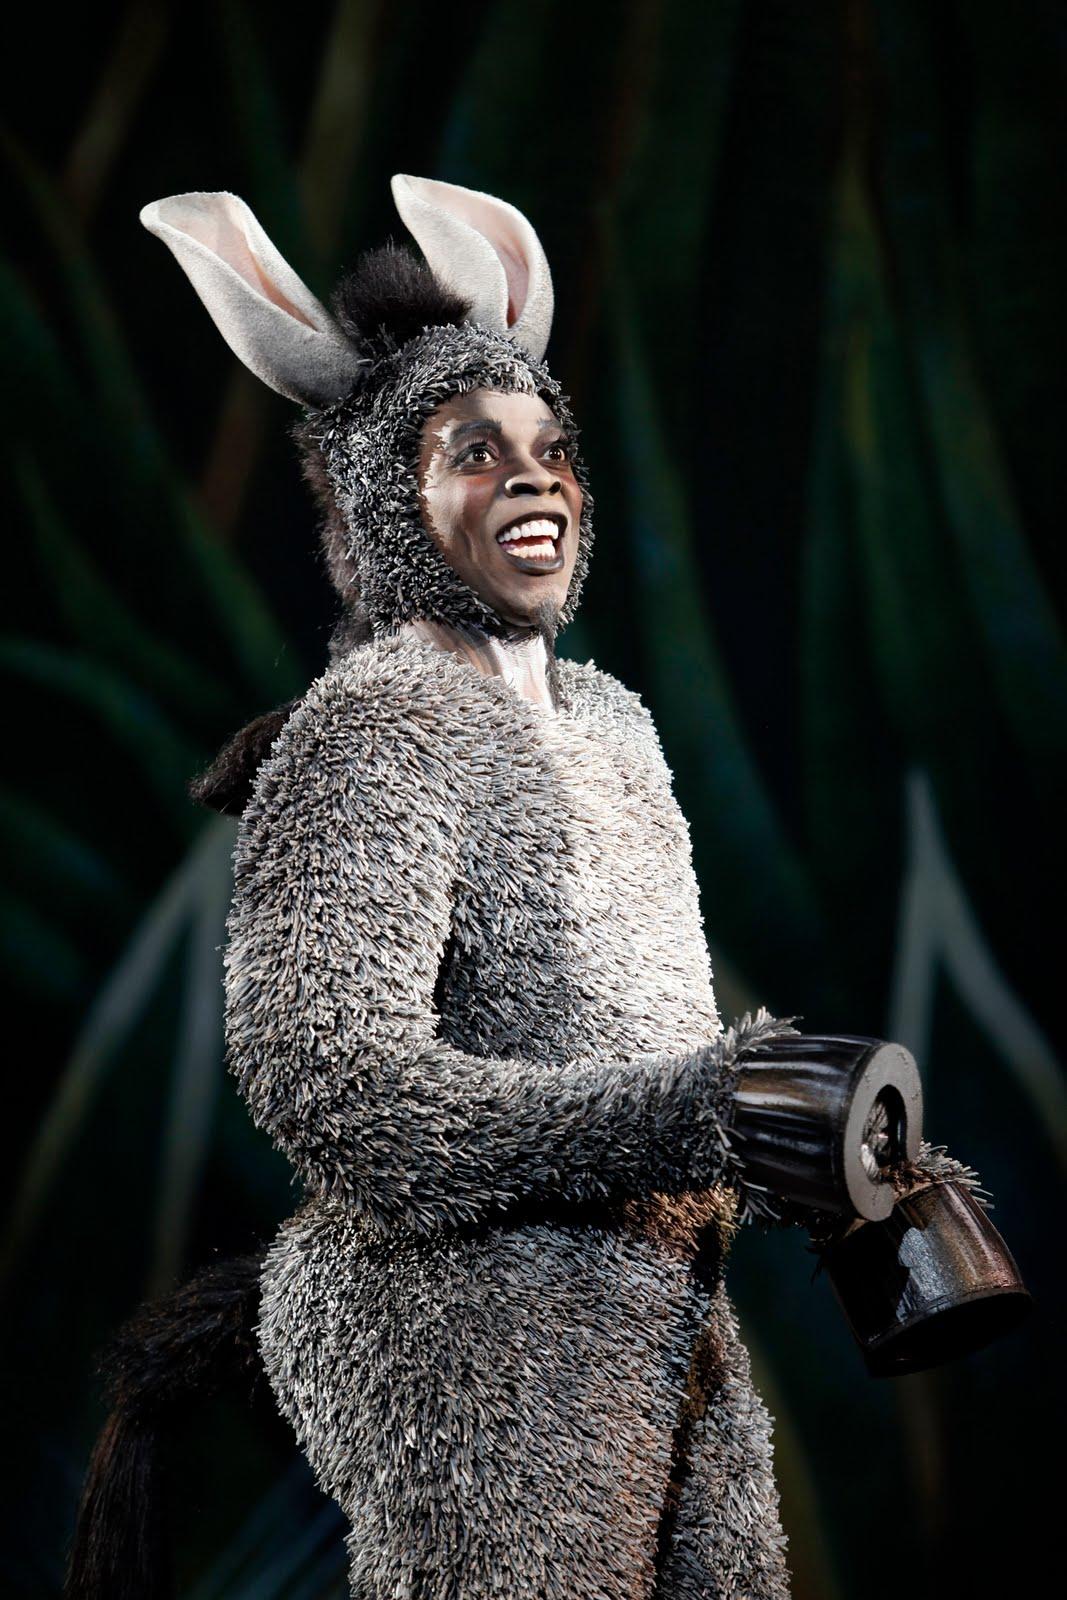 Shrek the Musical Donkey.jpeg  sc 1 st  WikiShrek - Fandom & Image - Shrek the Musical Donkey.jpeg | WikiShrek | FANDOM powered ...